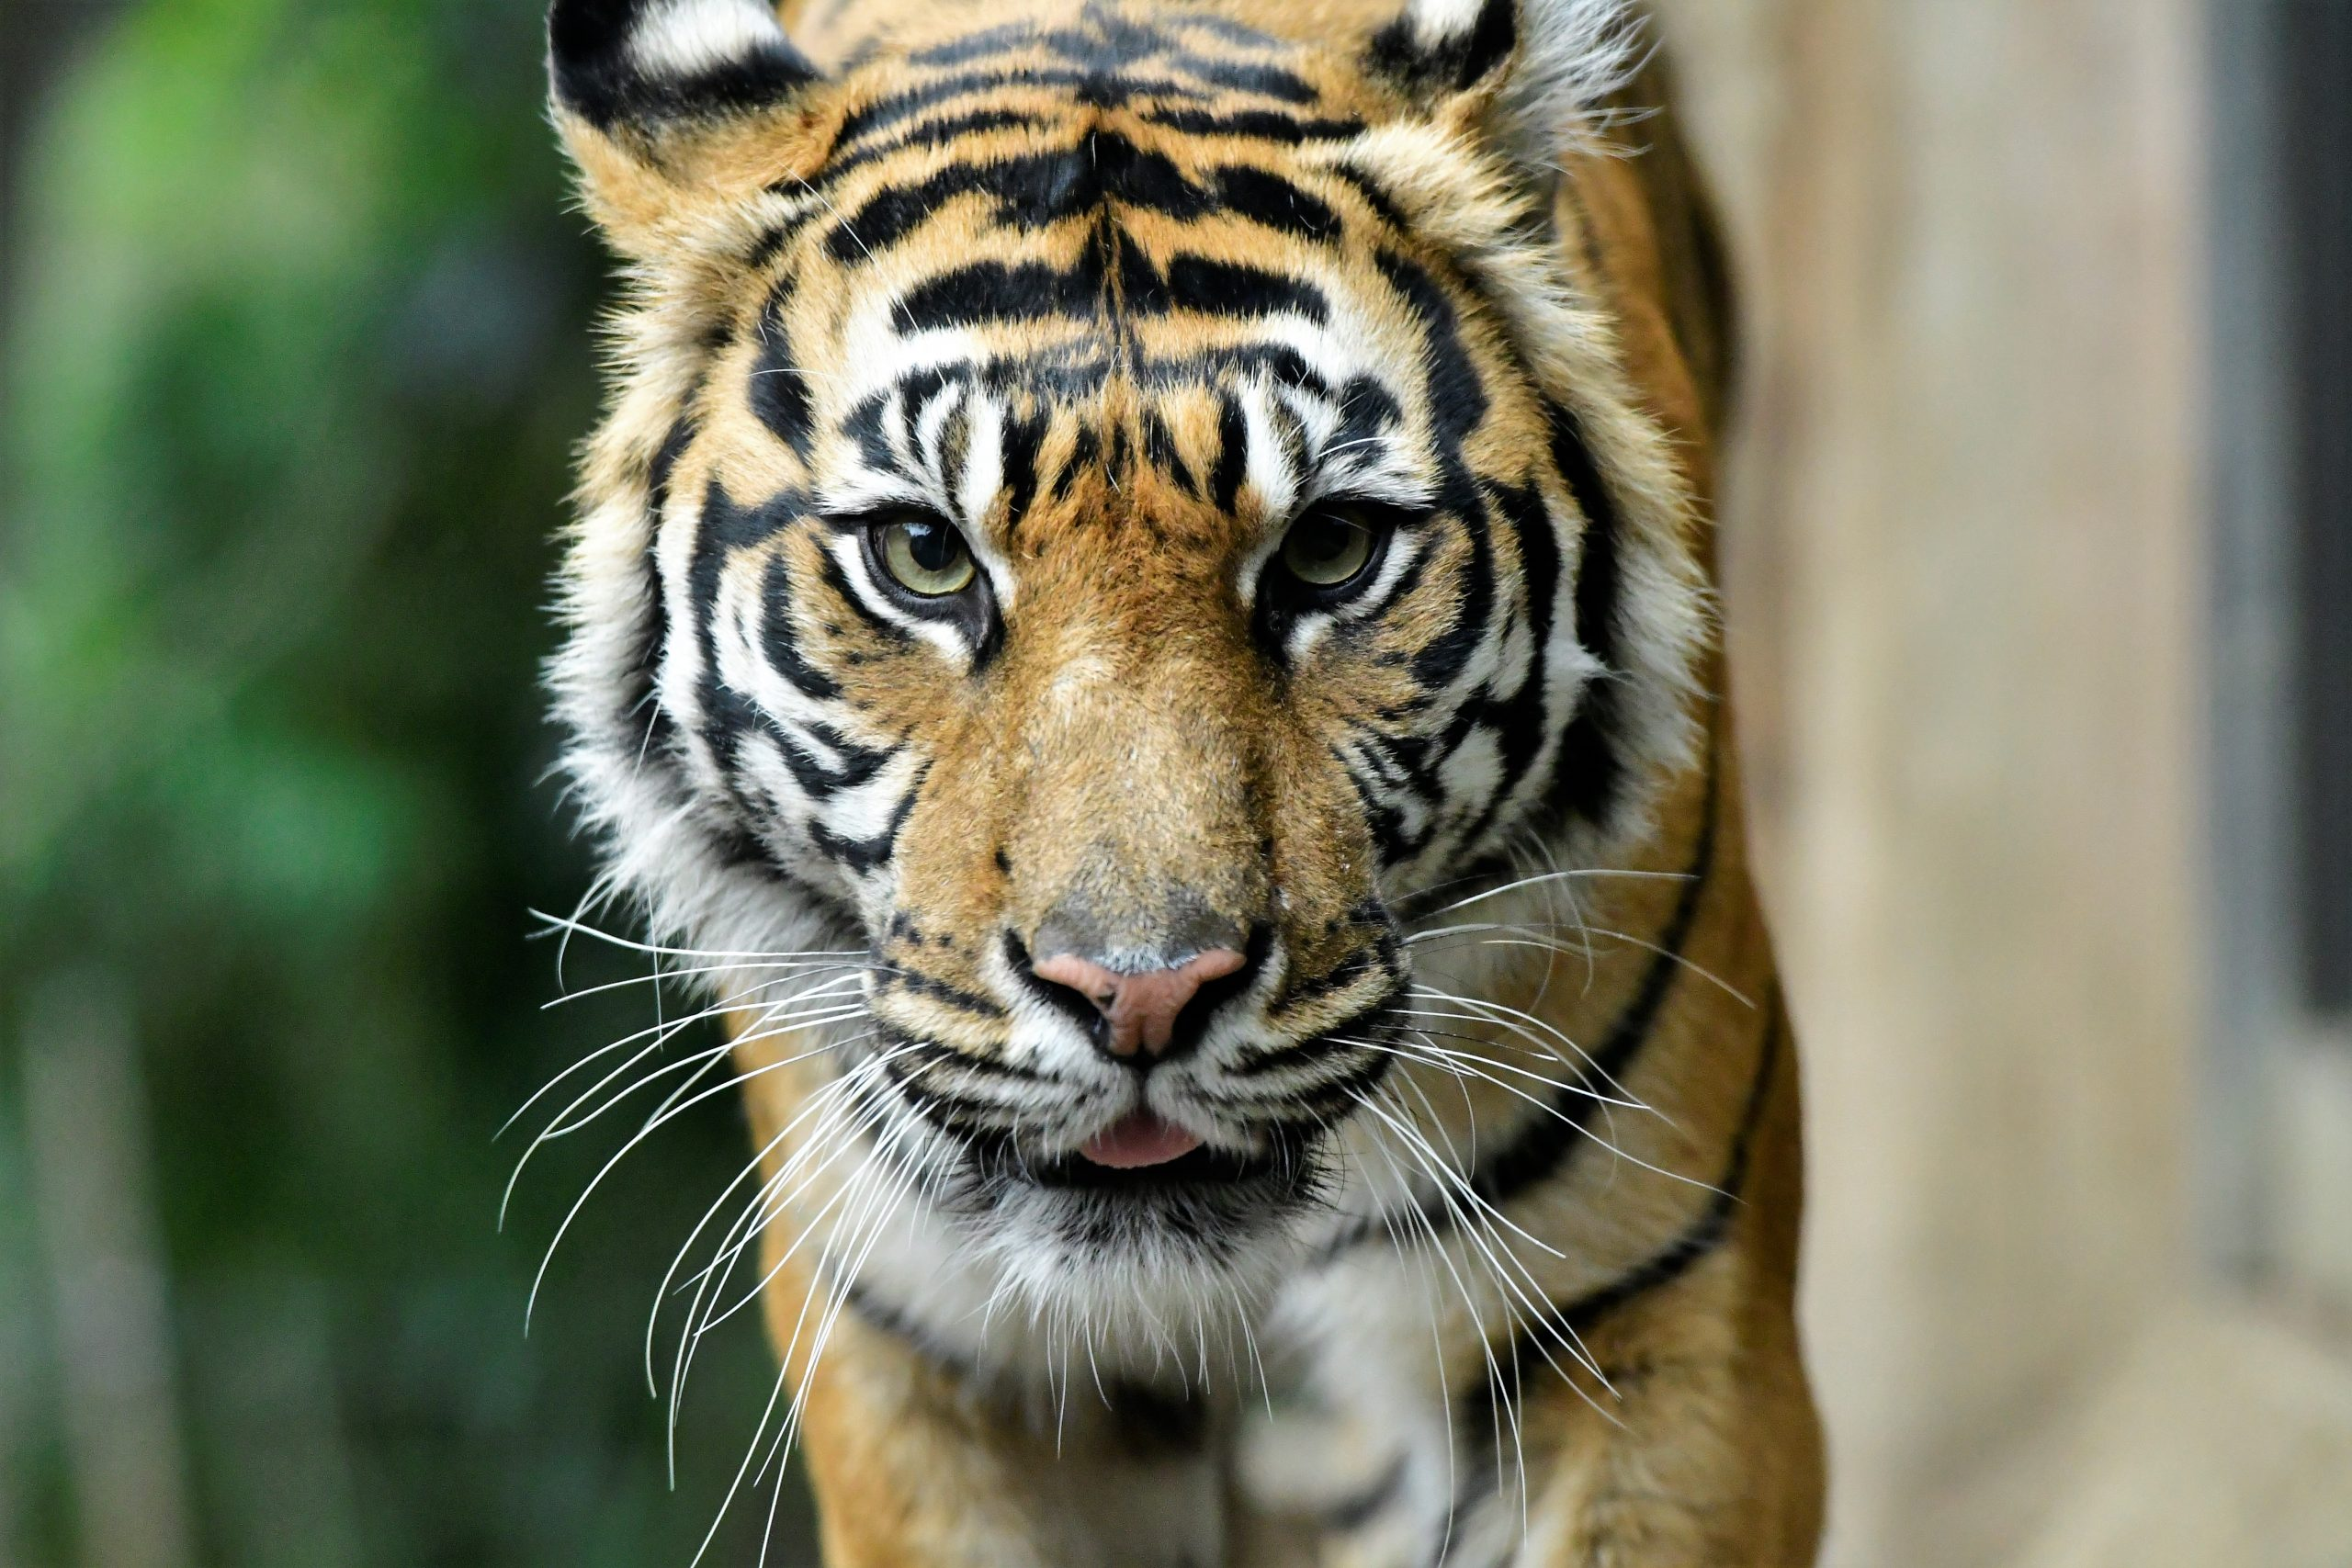 【Nikon】動物園でポートレート!